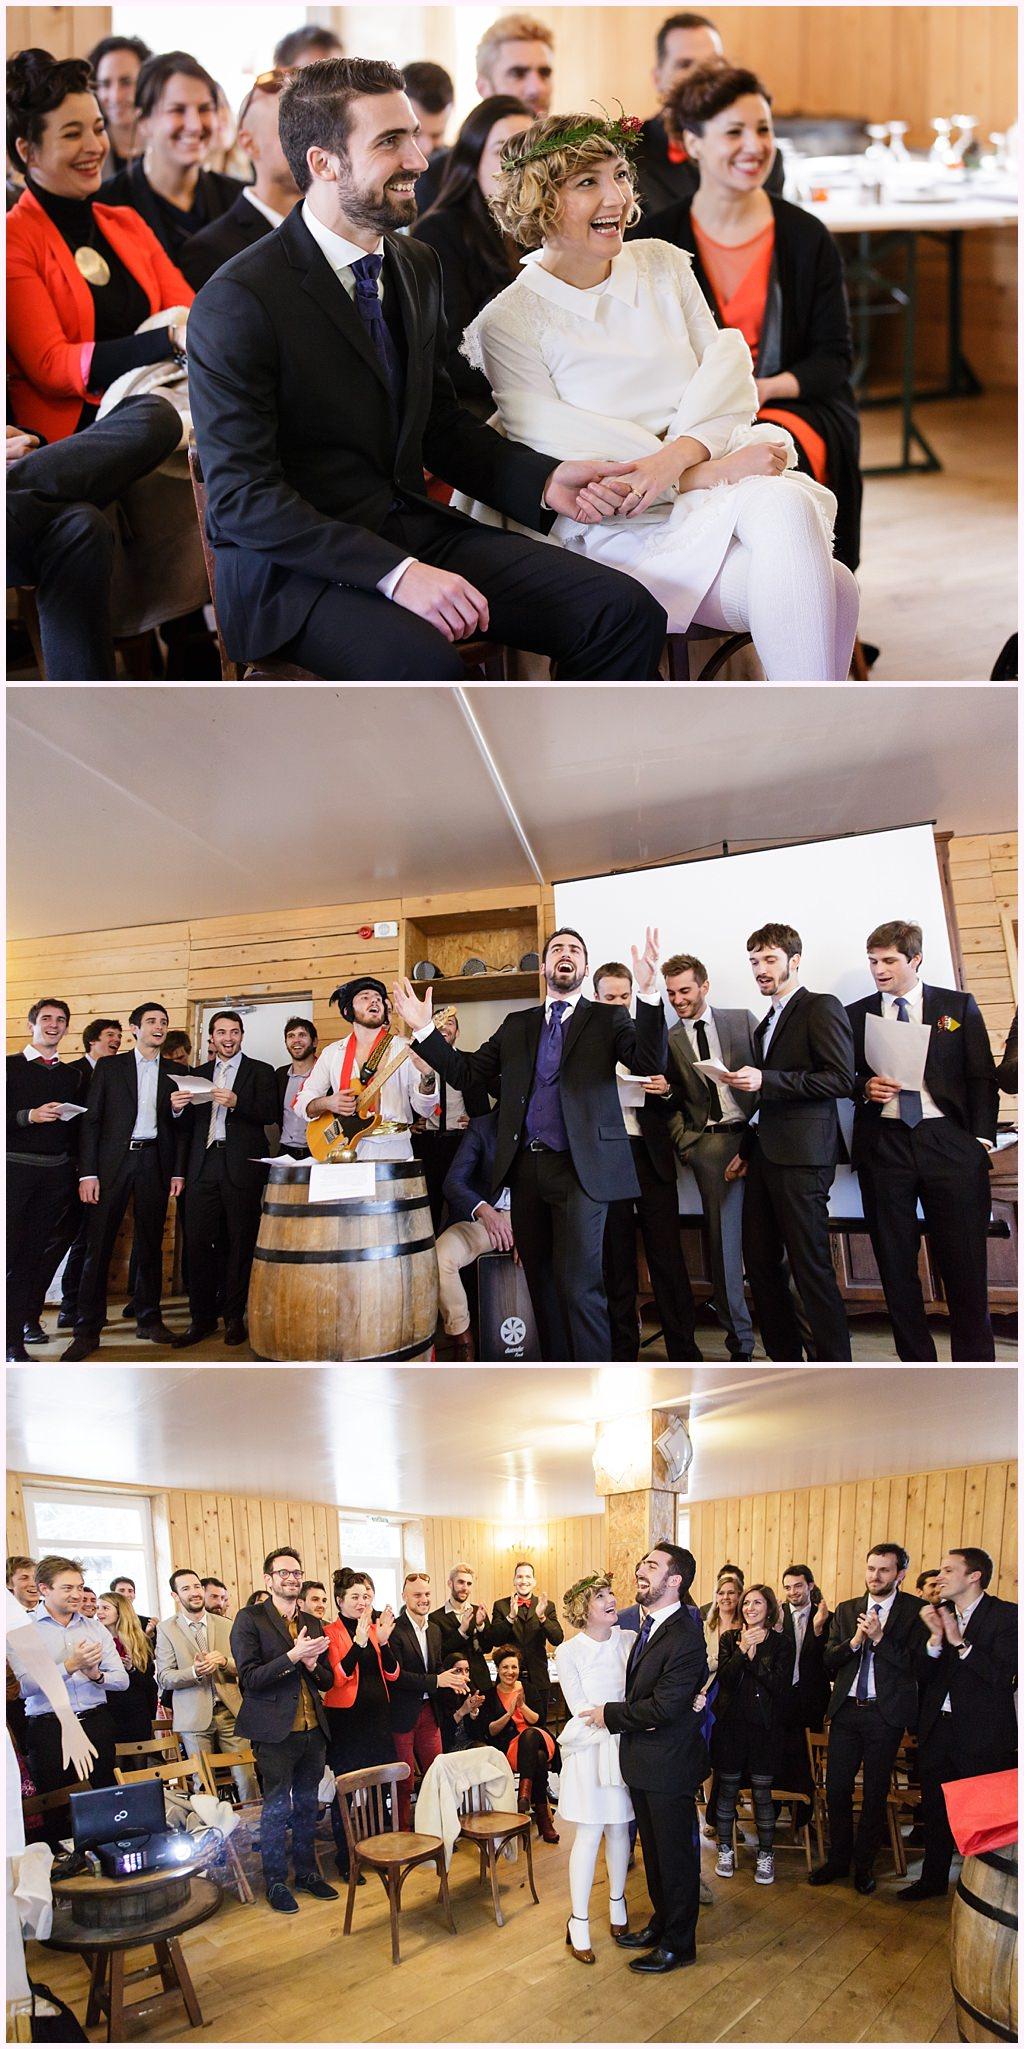 ceremonie laique elvis presley mariage hiver